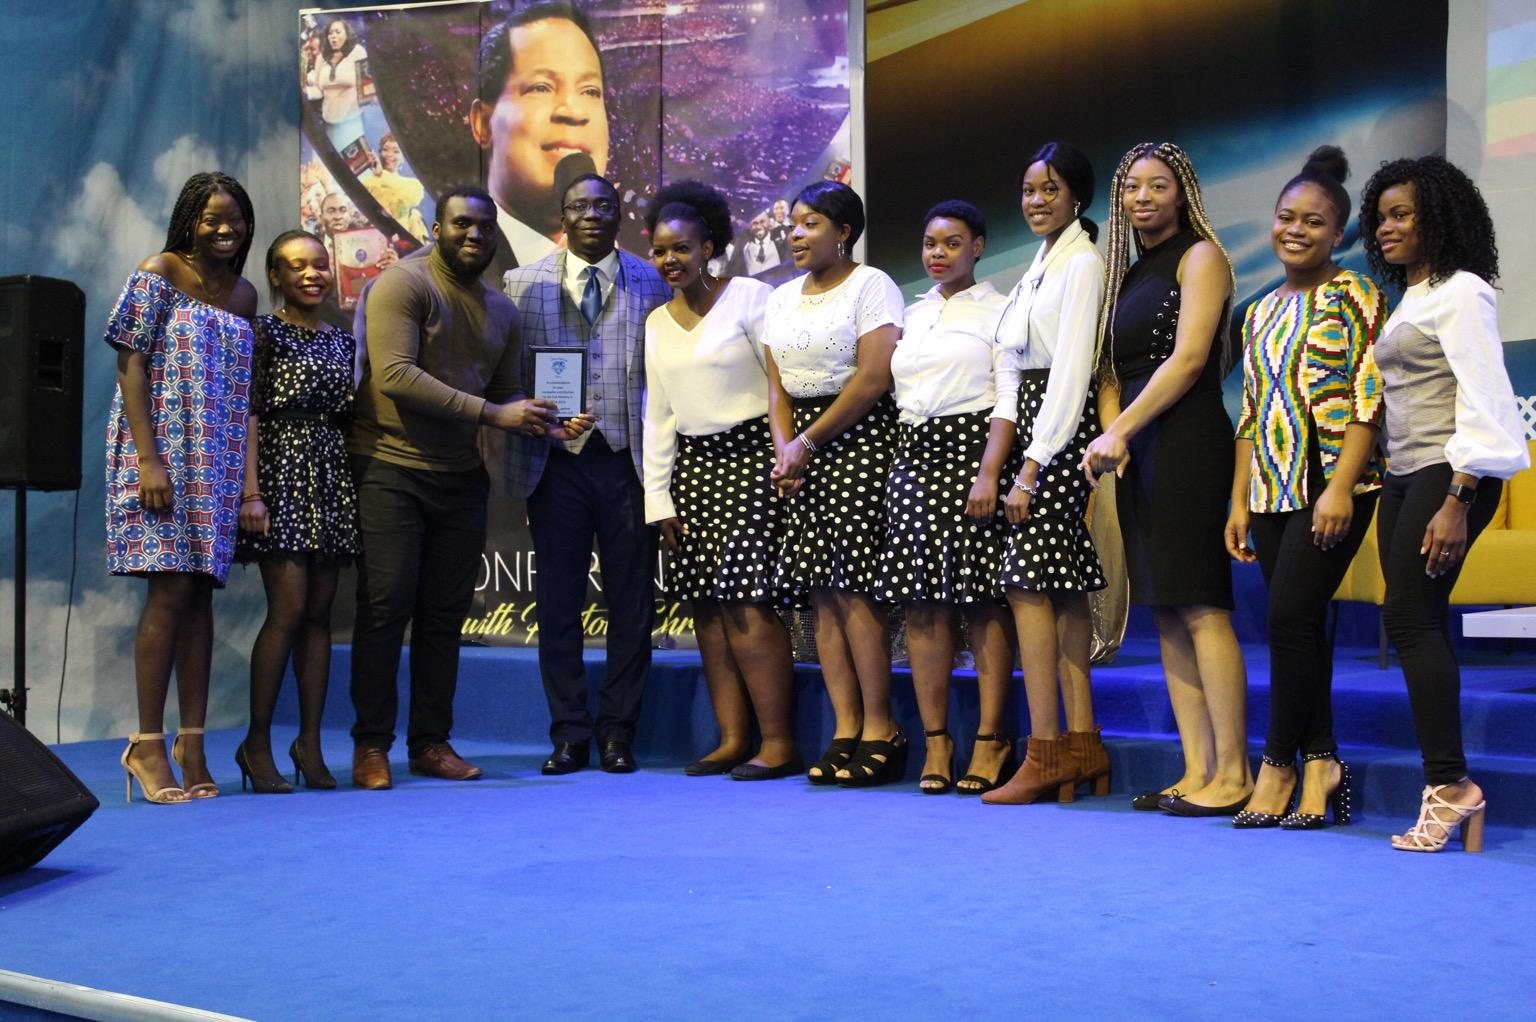 ICLC 2019 AWARDS. Congratulations to